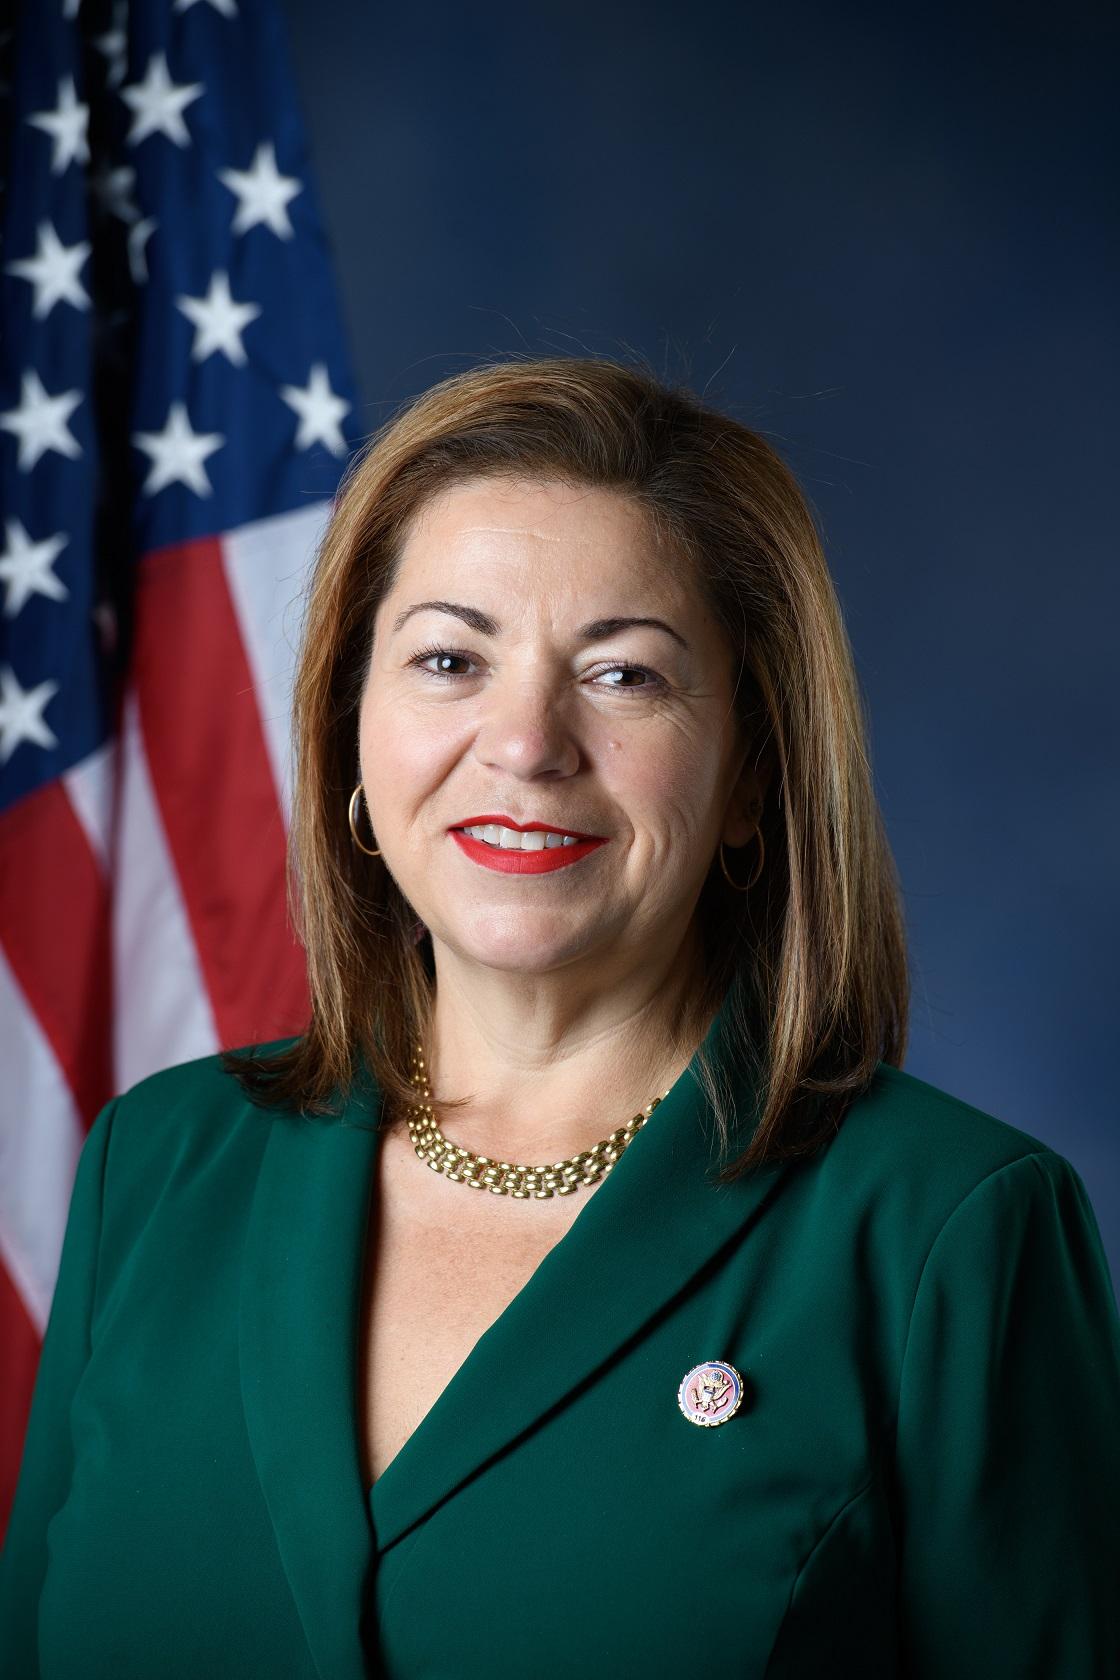 Linda_Sanchez_116th_Congress_official_photo.jpg